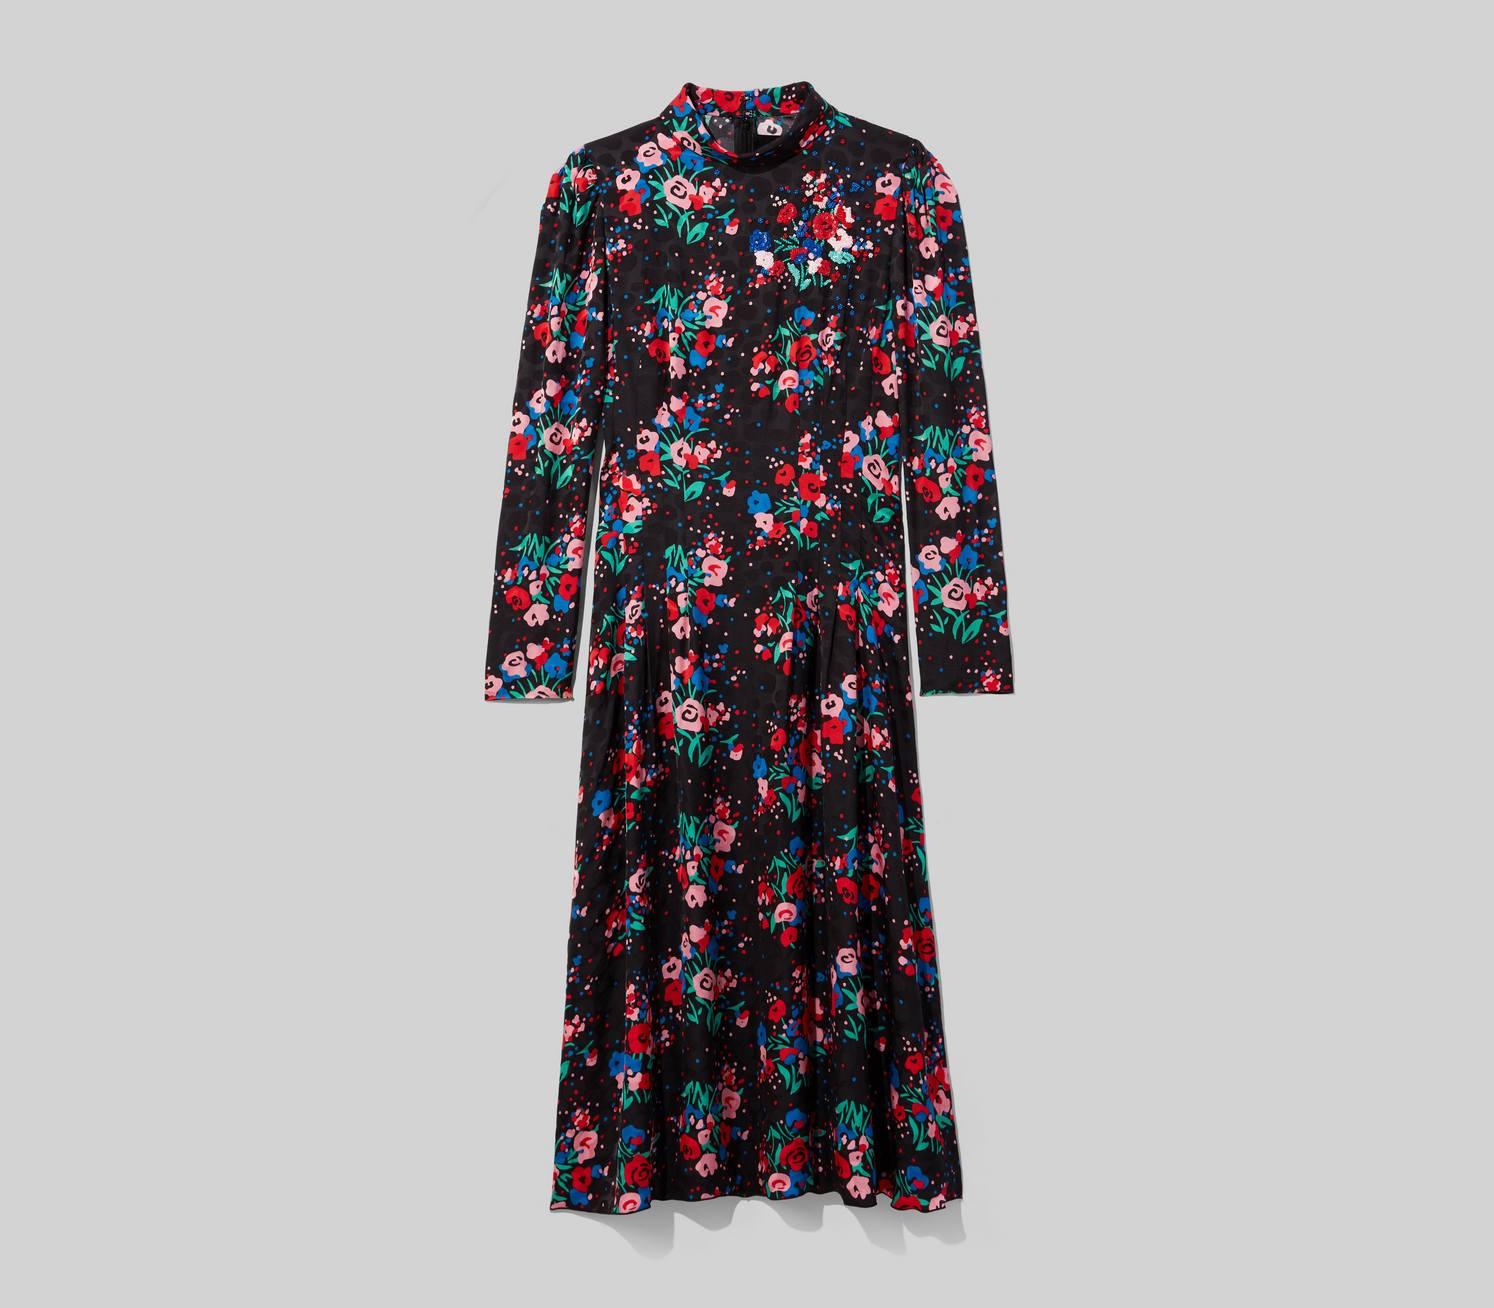 MARC JACOBS 40'S Dress